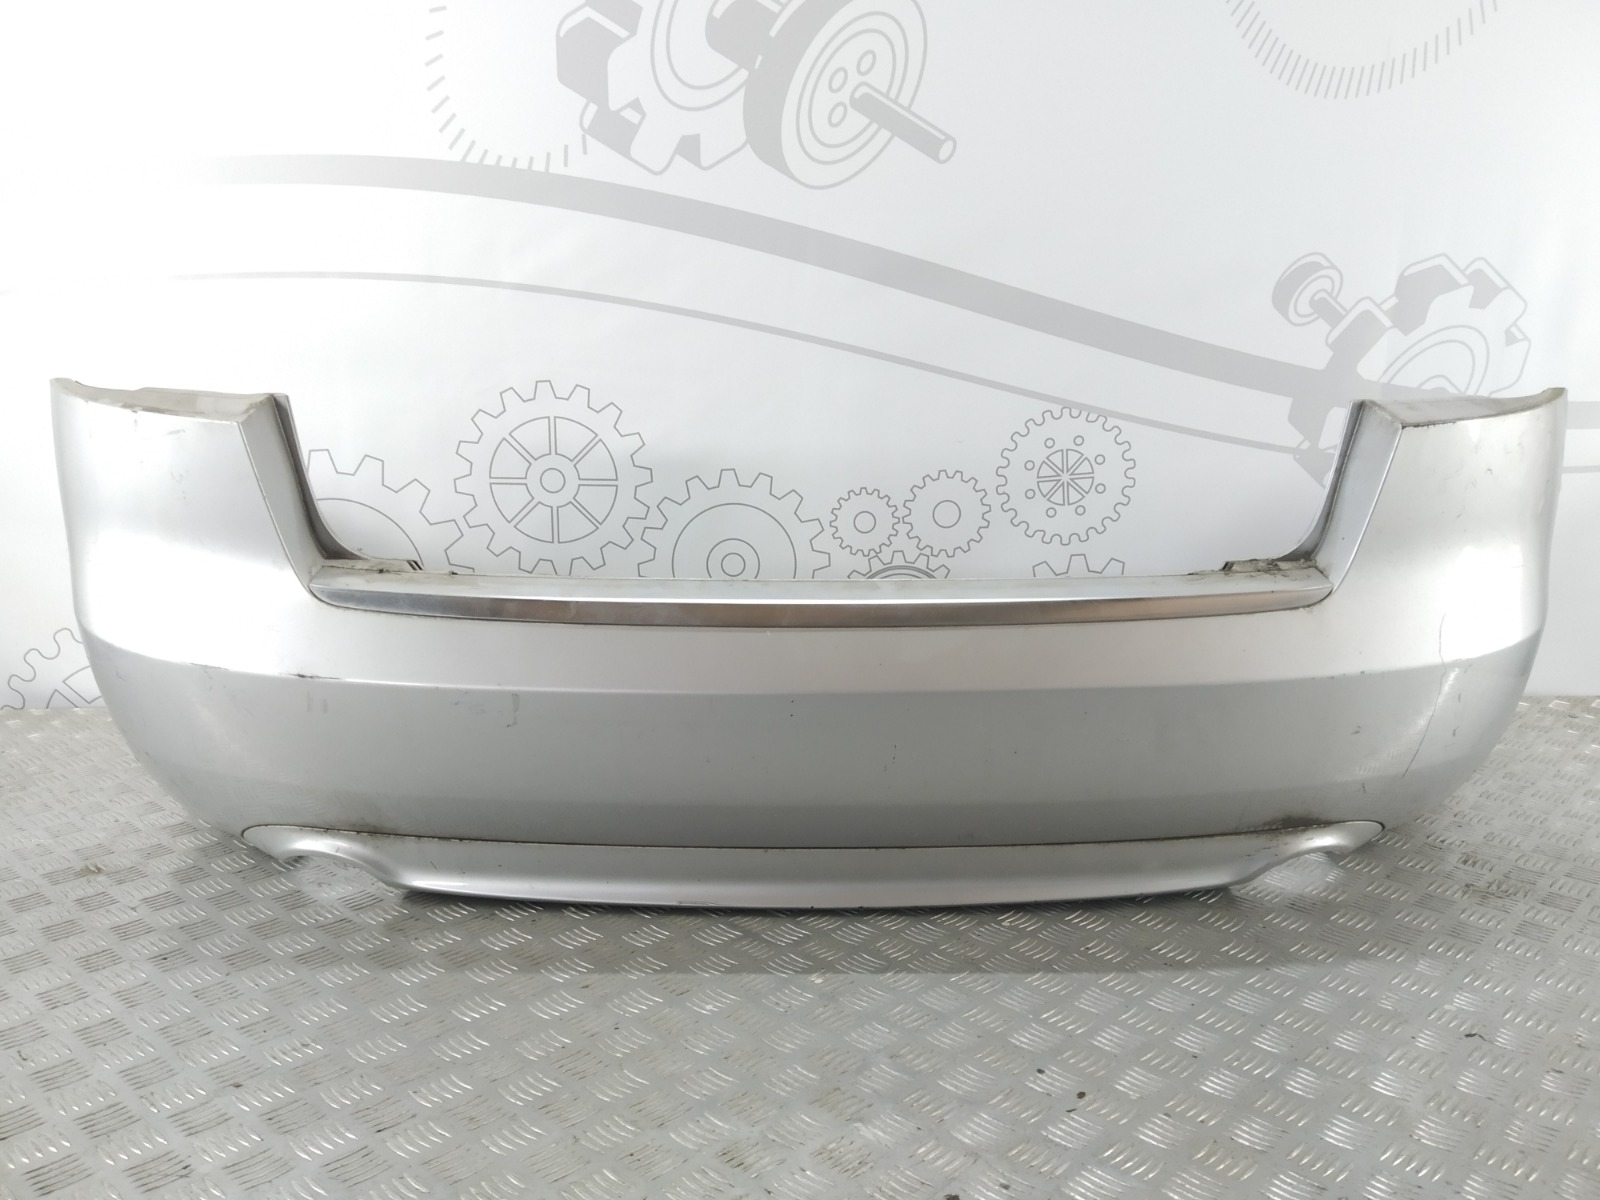 Бампер задний Audi A4 B7 2.0 TFSI 2006 (б/у)